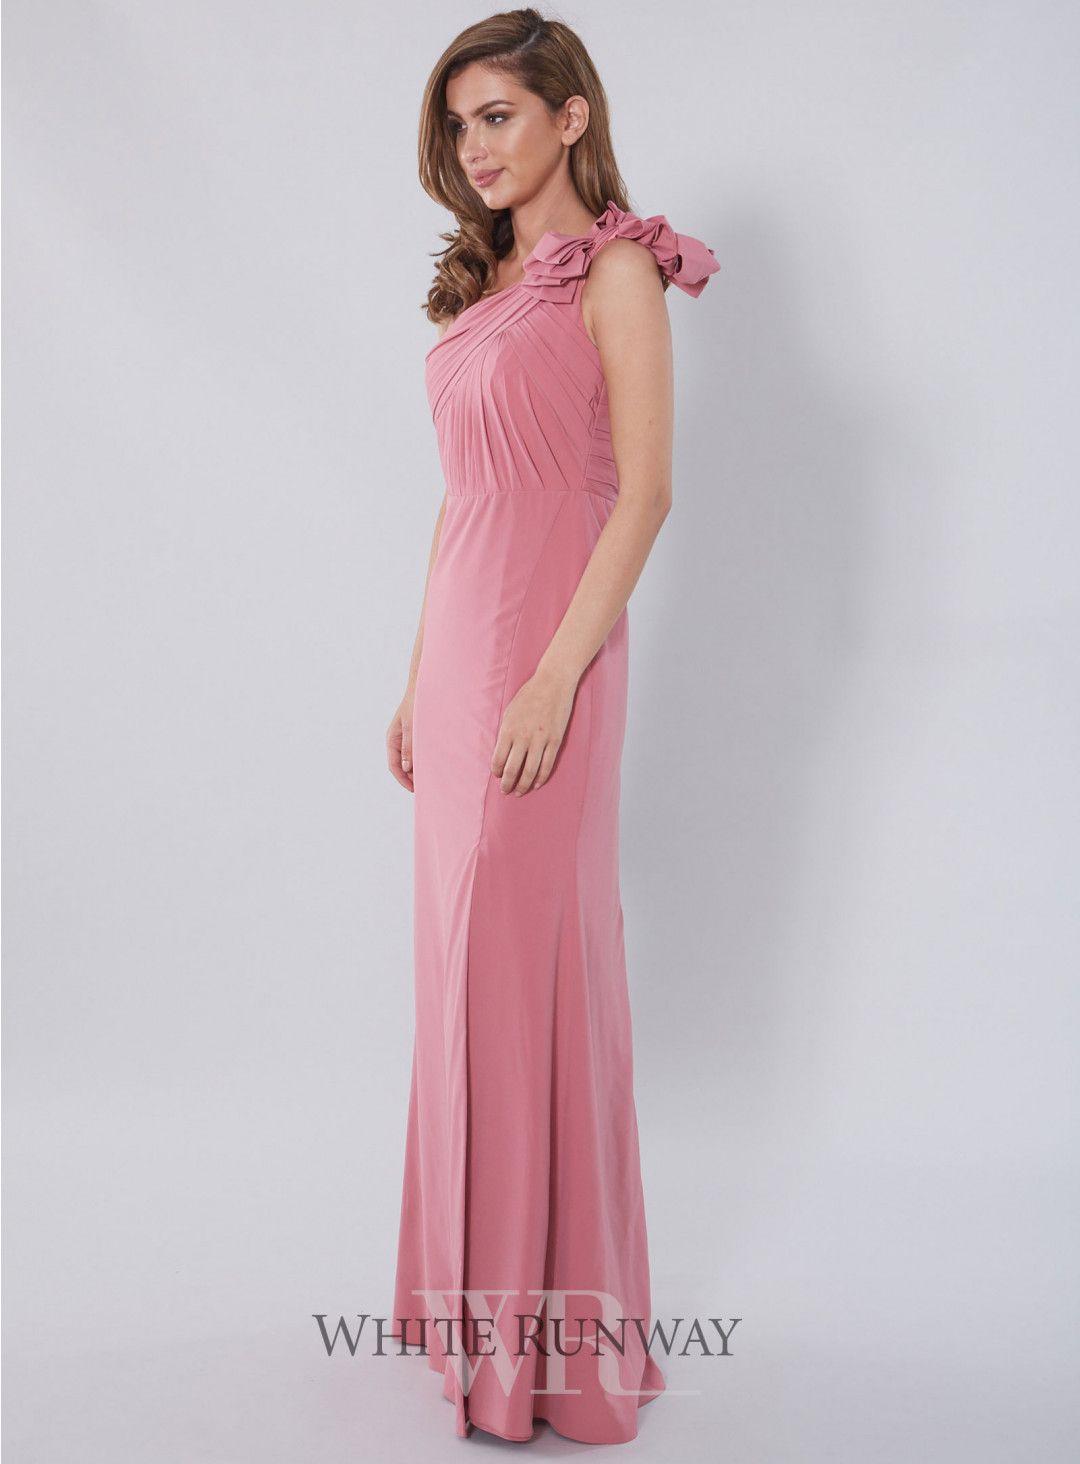 6eb9c2b41c The  brand new 05e0b 80c81 Kamilla One Shoulder Dress. Stunning full length  dress by Samantha Rose  info for d90bd adac7 Matea Gown. A stunning full ...